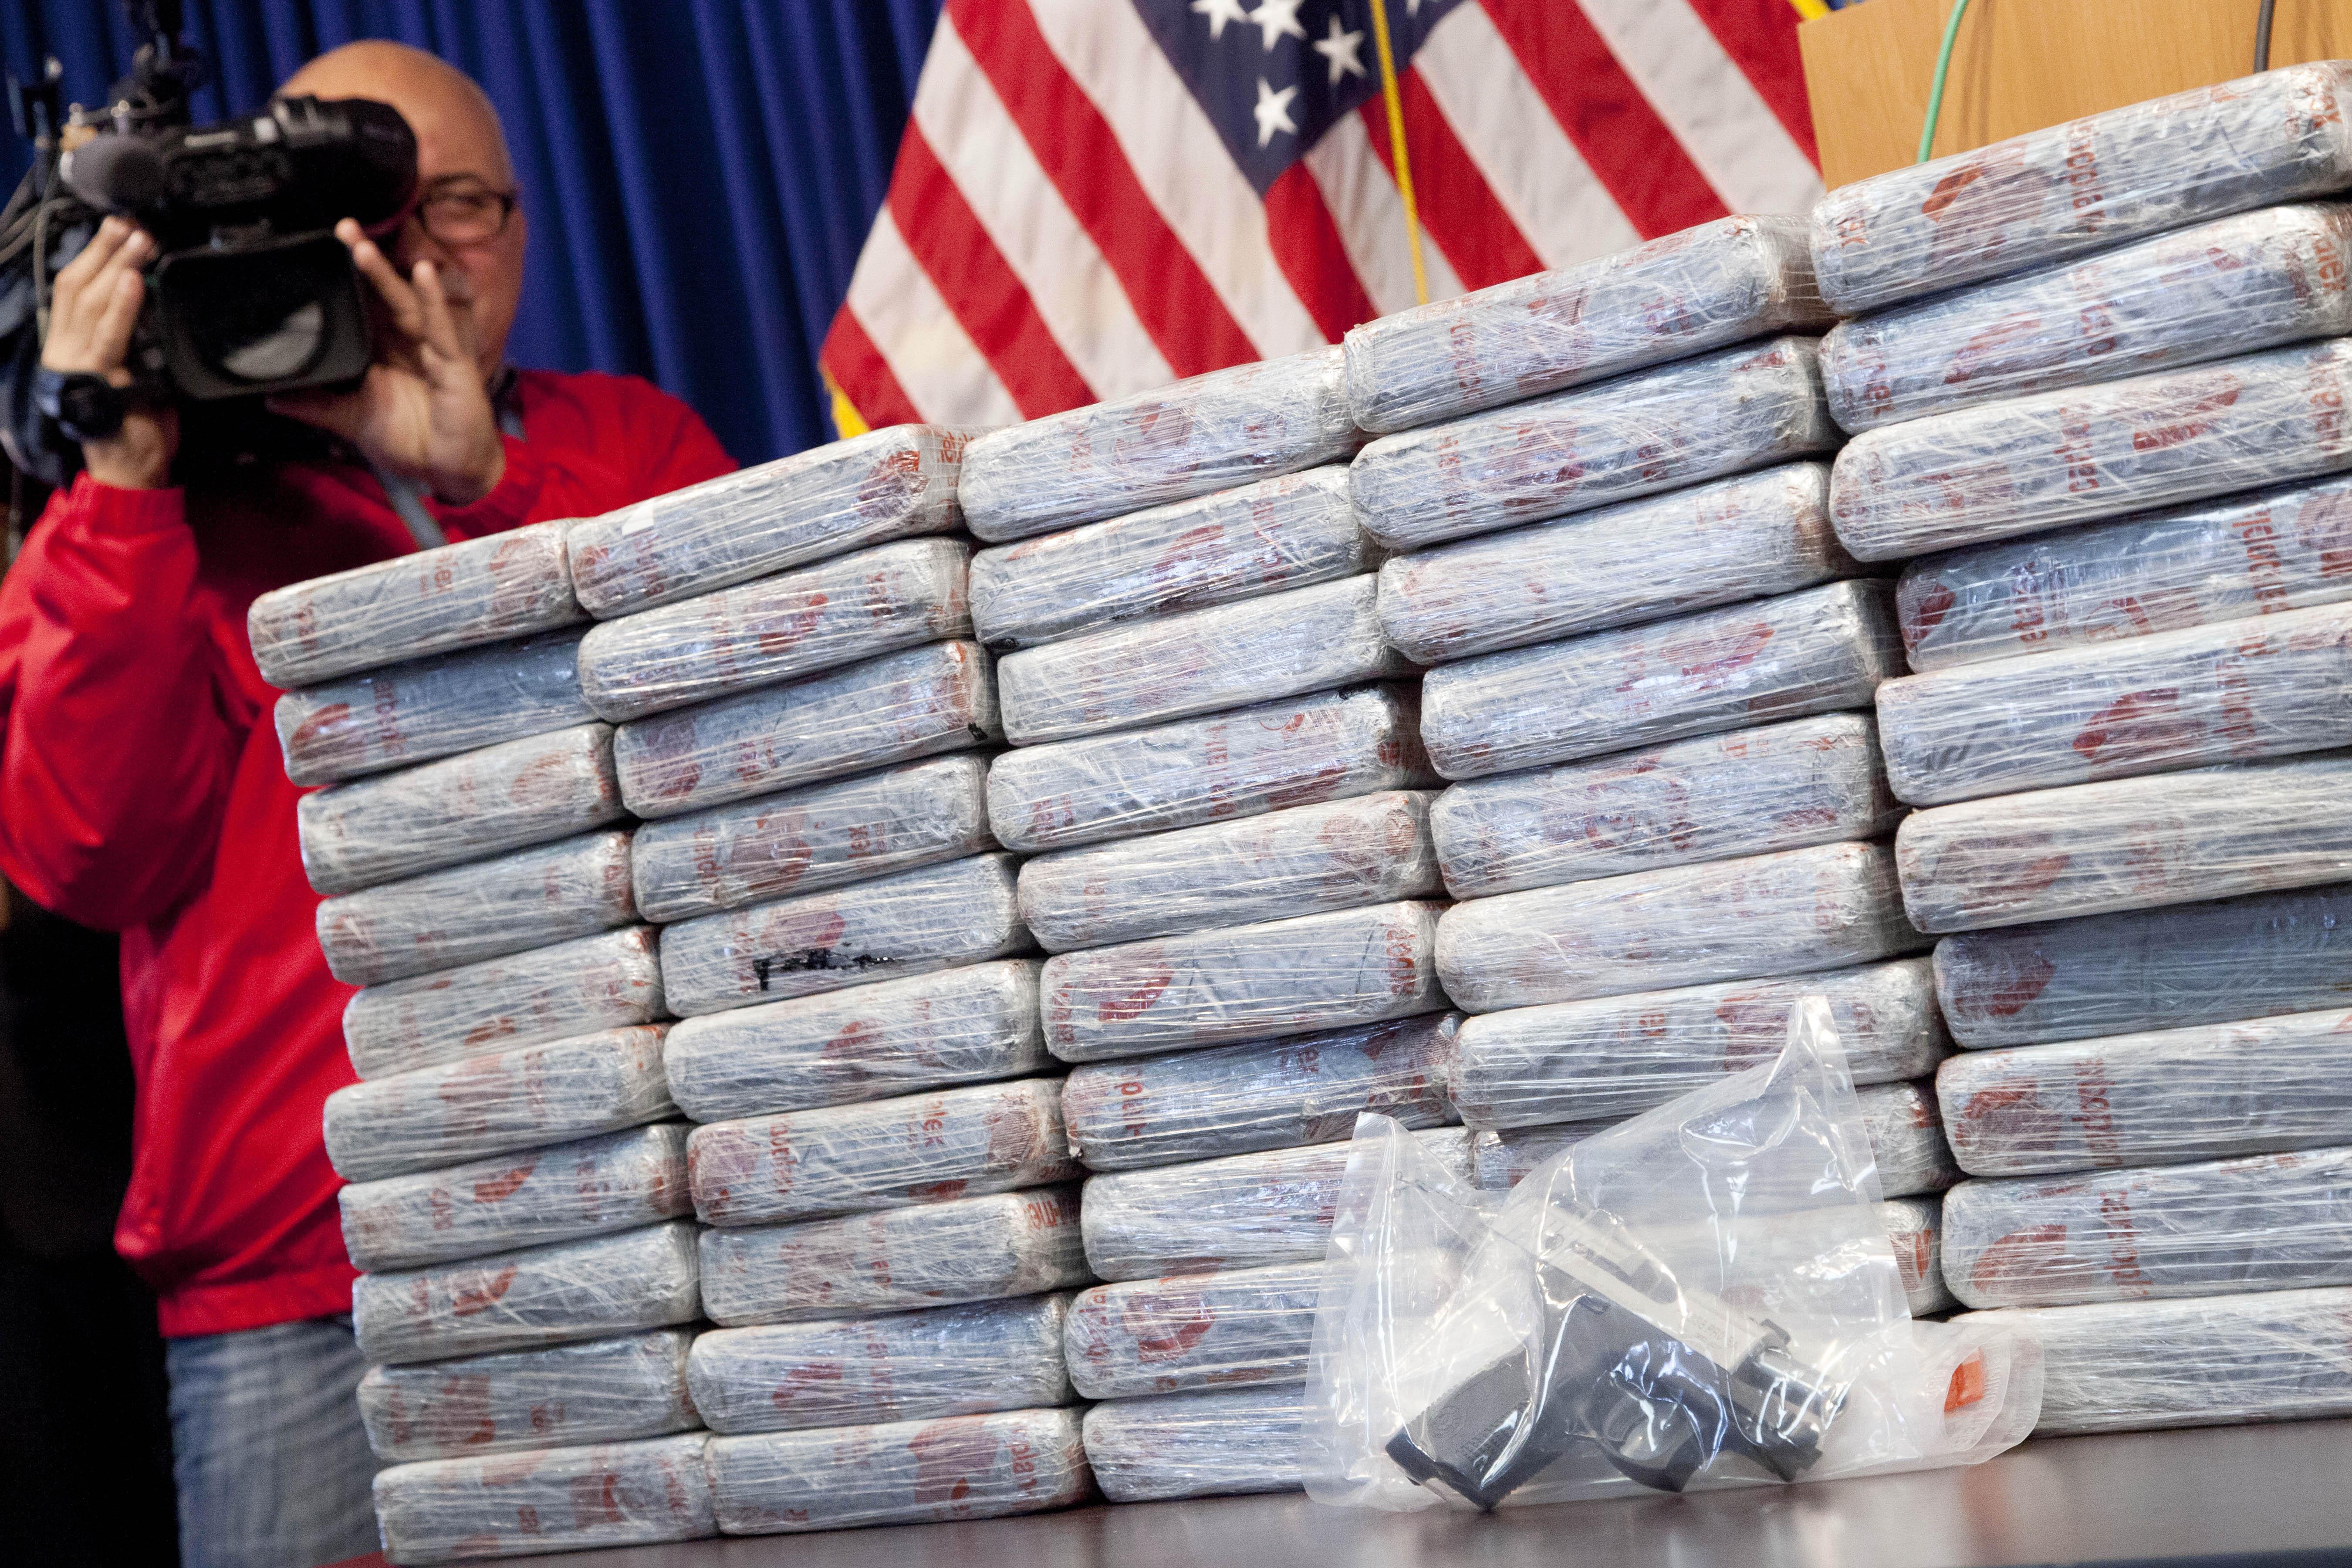 Heroin influx, overdose spike alarm U S  gov't - Washington Times